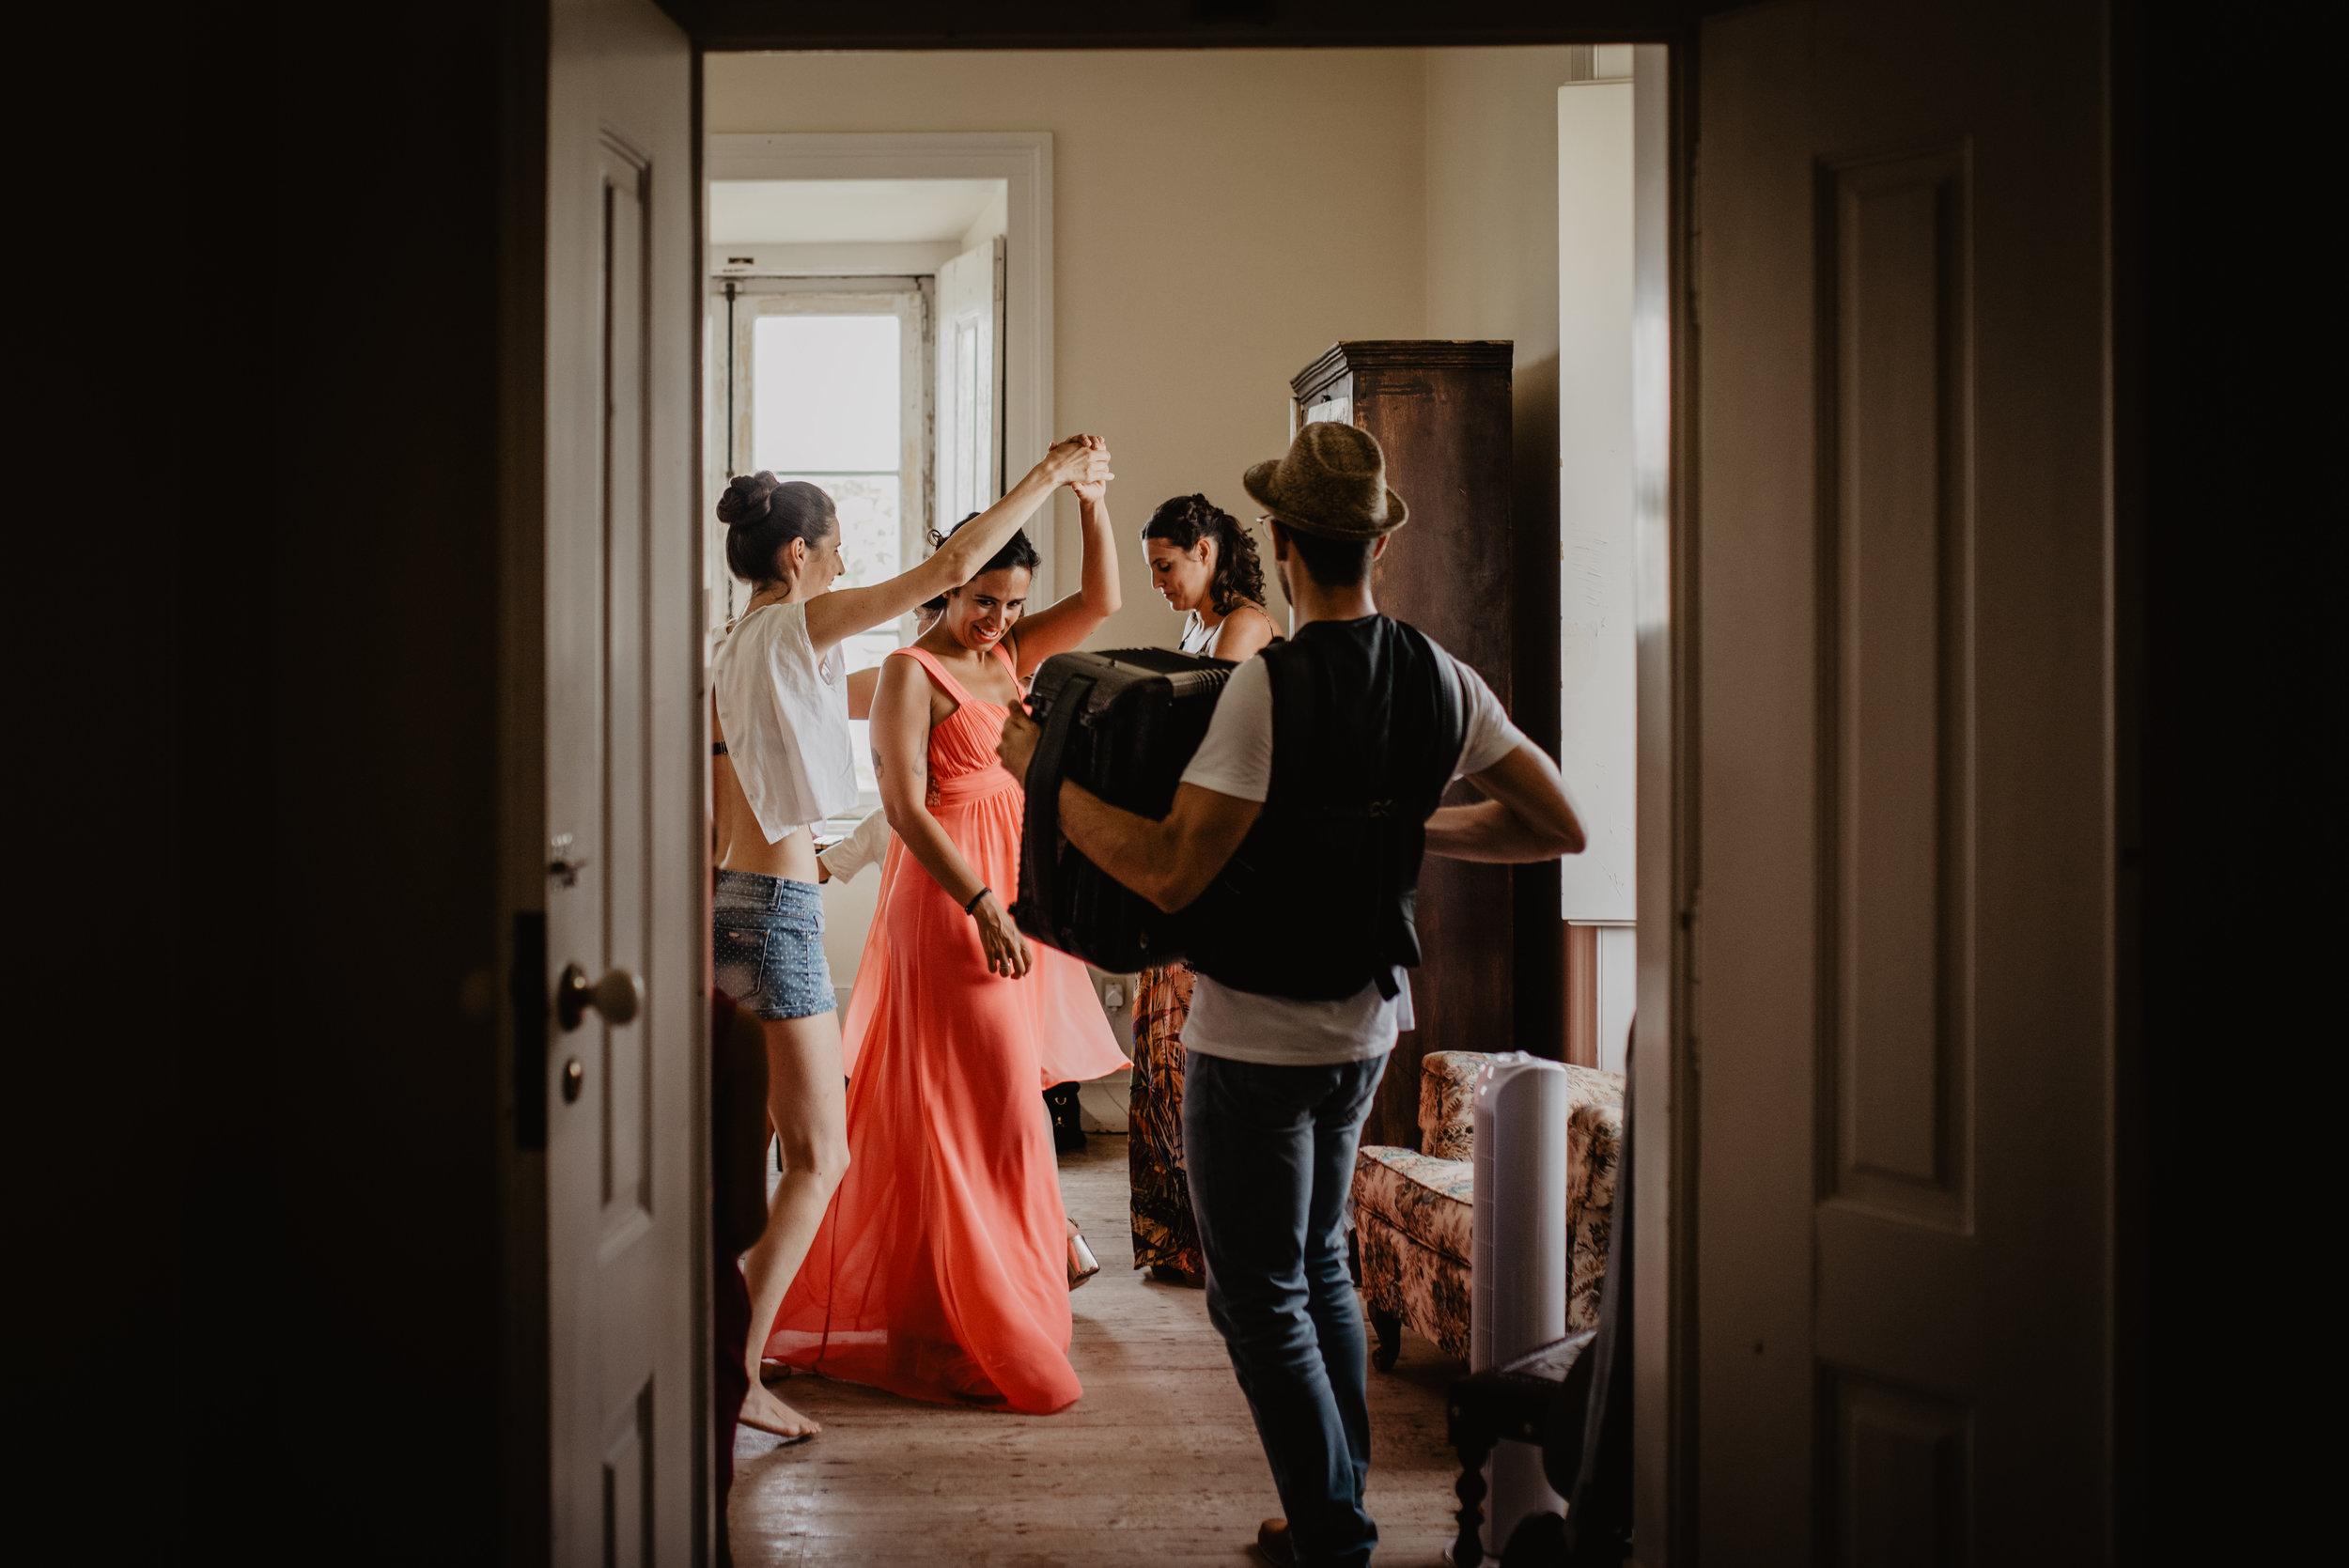 Lapela-photography-wedding-sintra-portugal-30.jpg